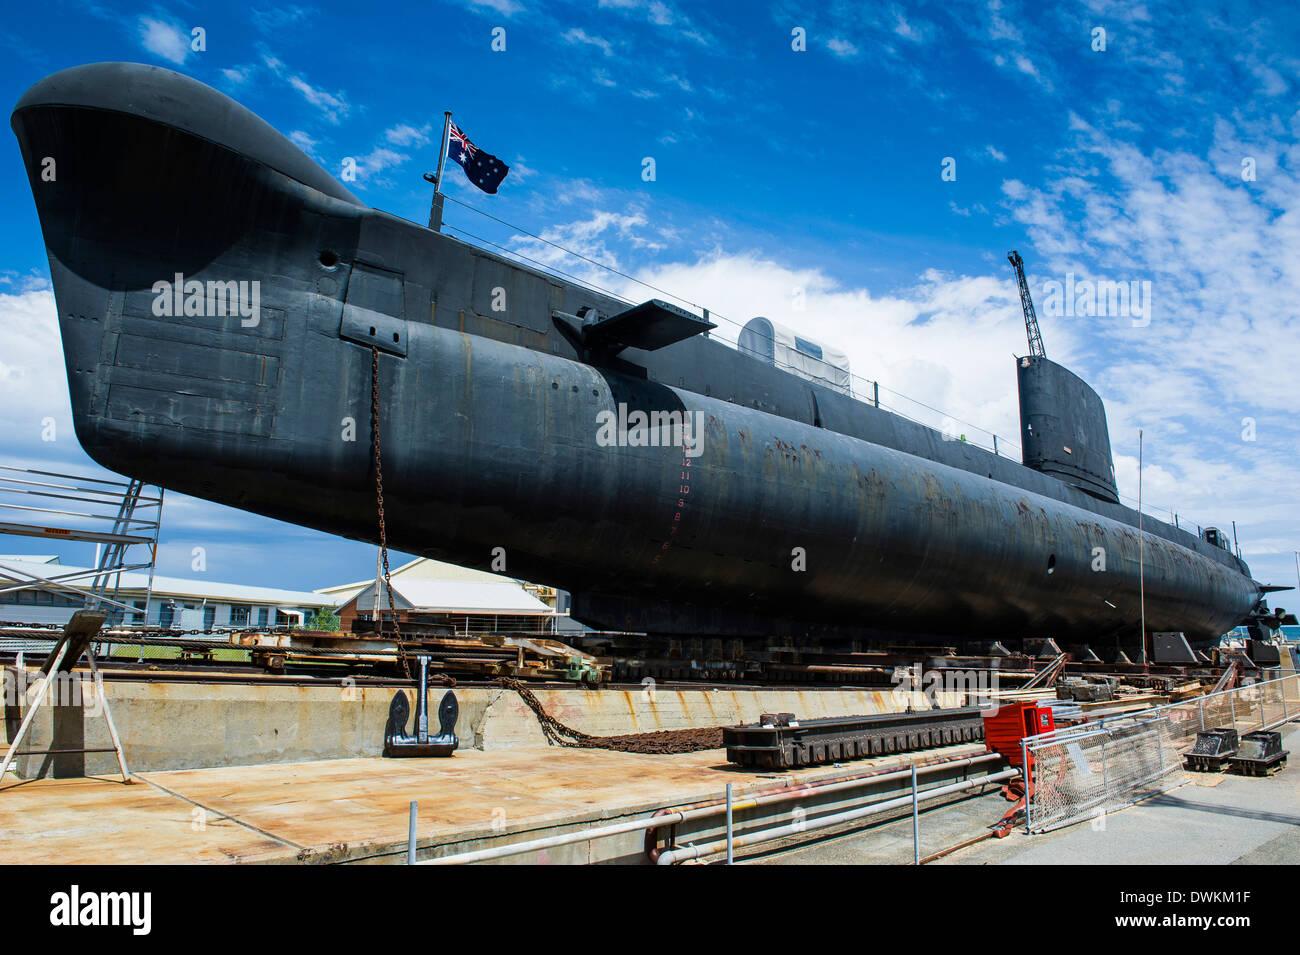 HMAS Hornos submarino en el Museo Marítimo de Australia Occidental, Fremantle, Australia Occidental, Australia, Imagen De Stock